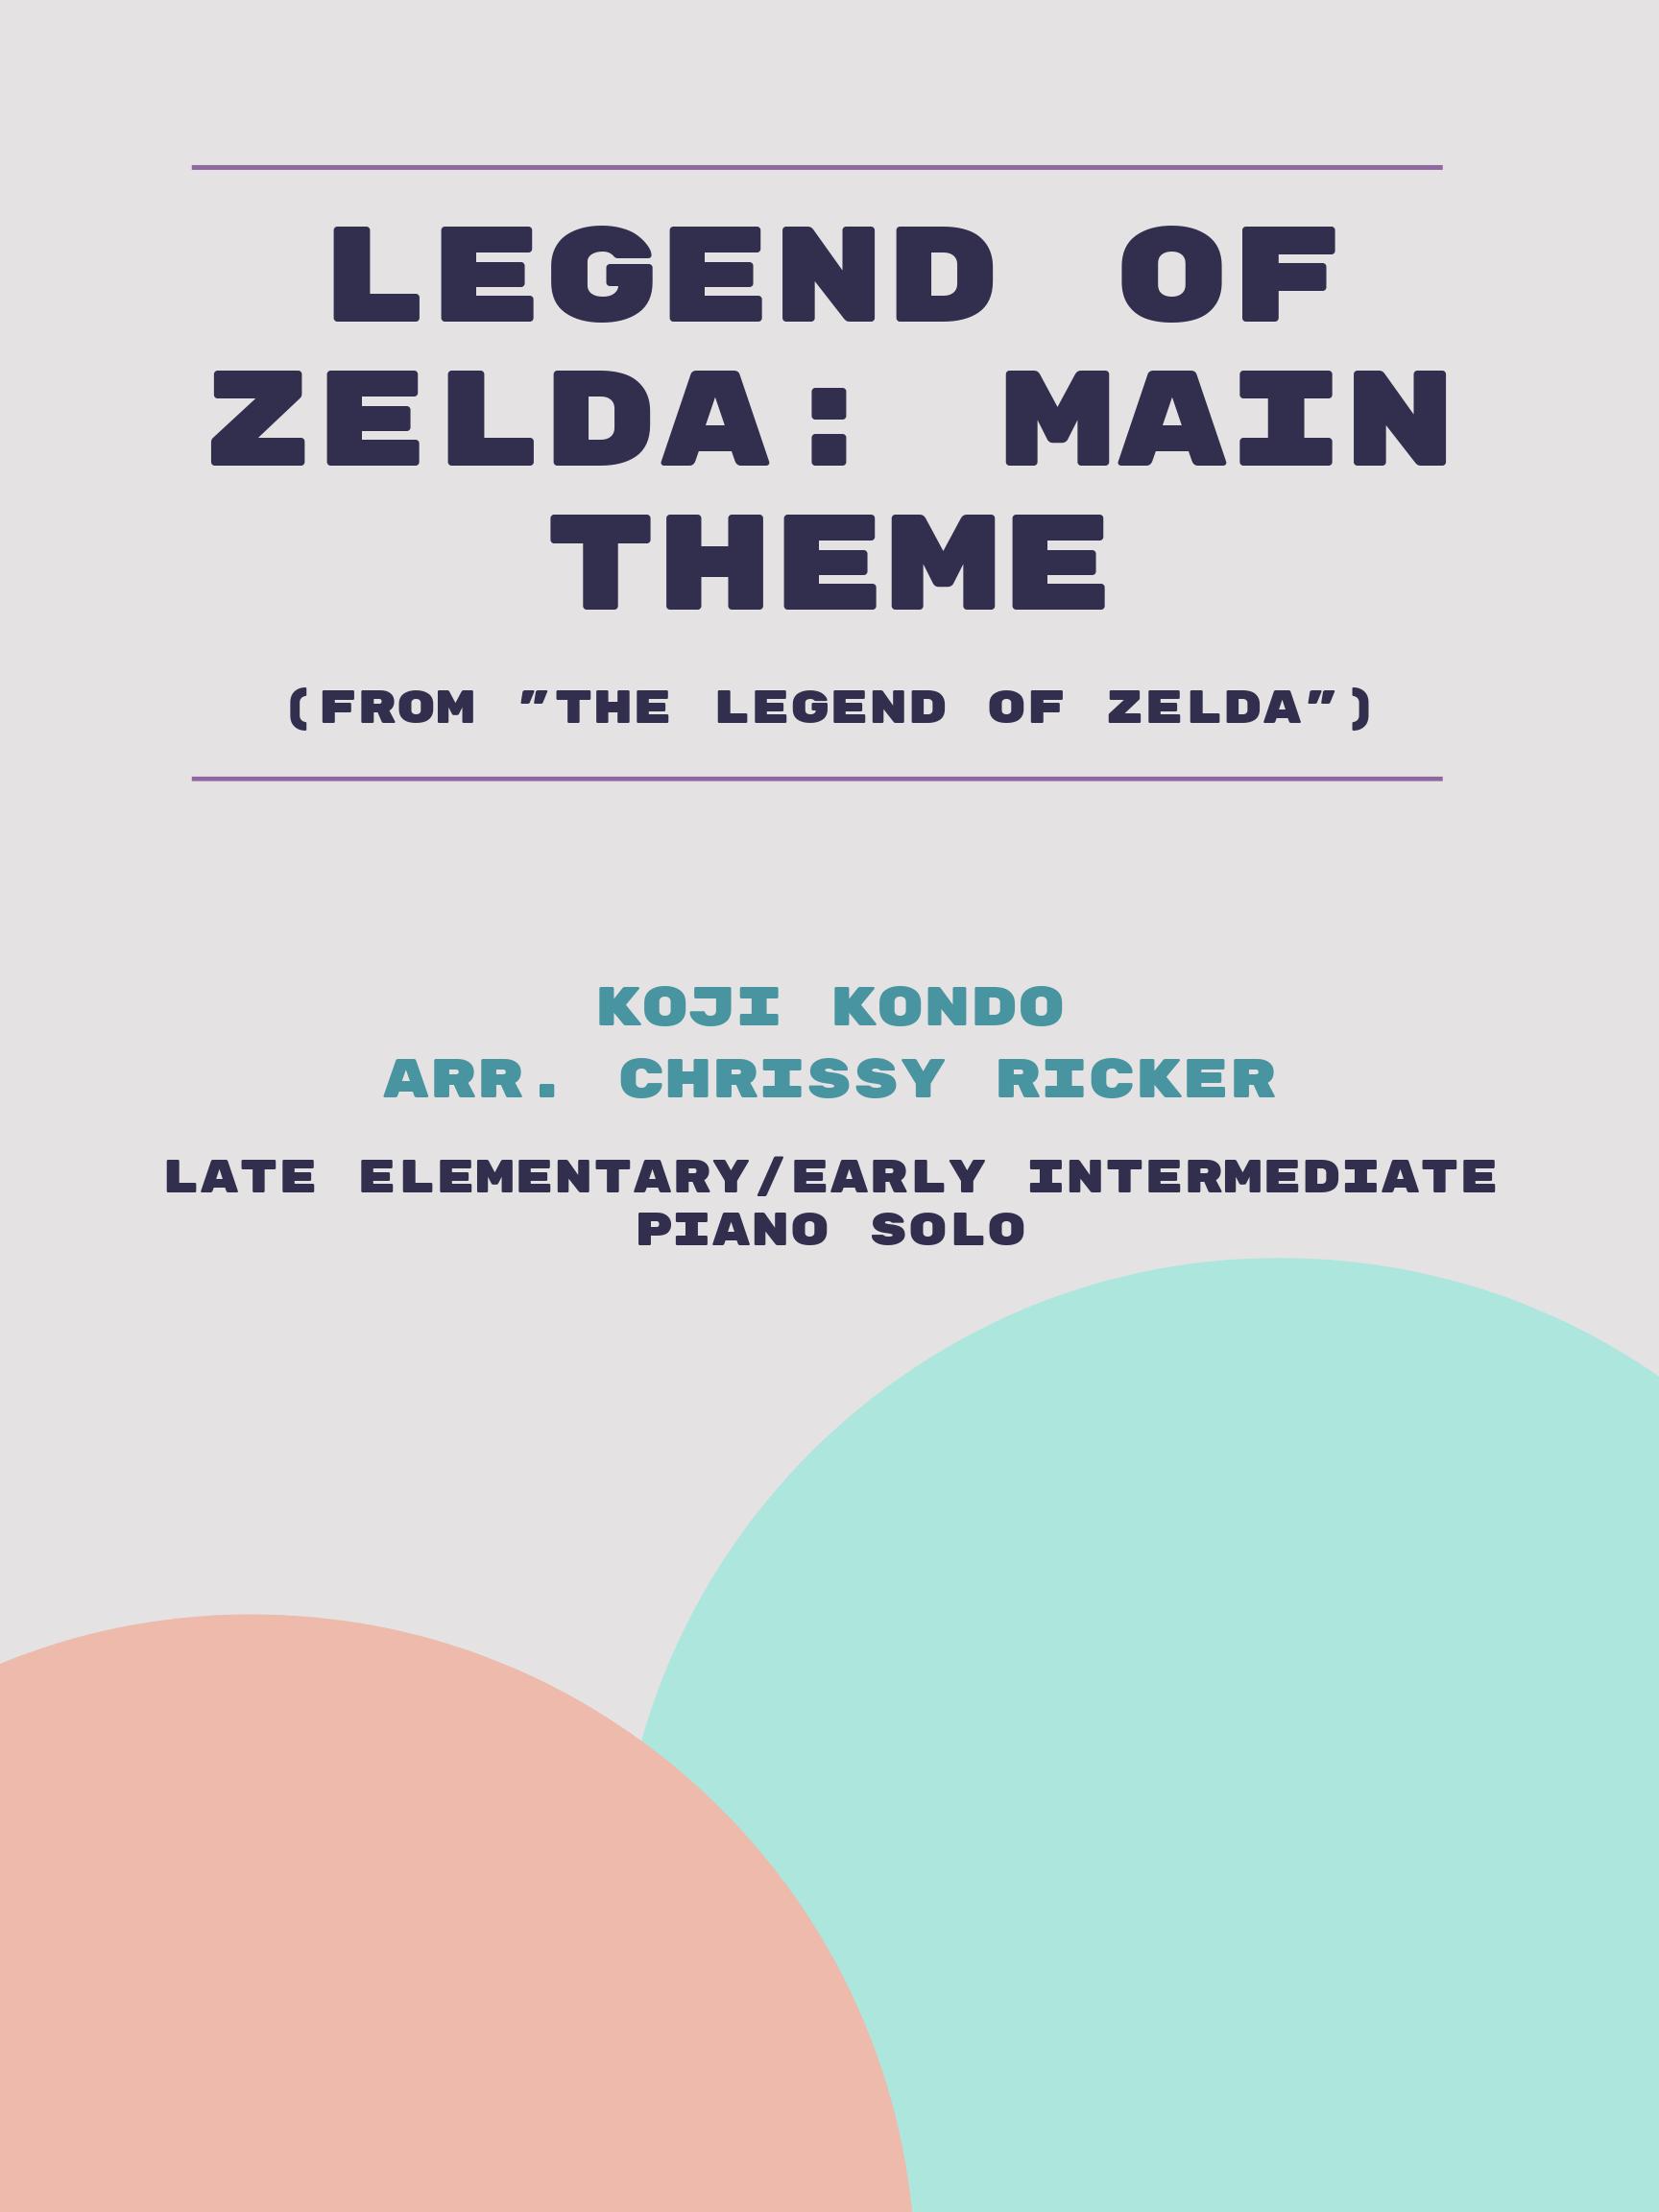 Legend of Zelda: Main Theme by Koji Kondo